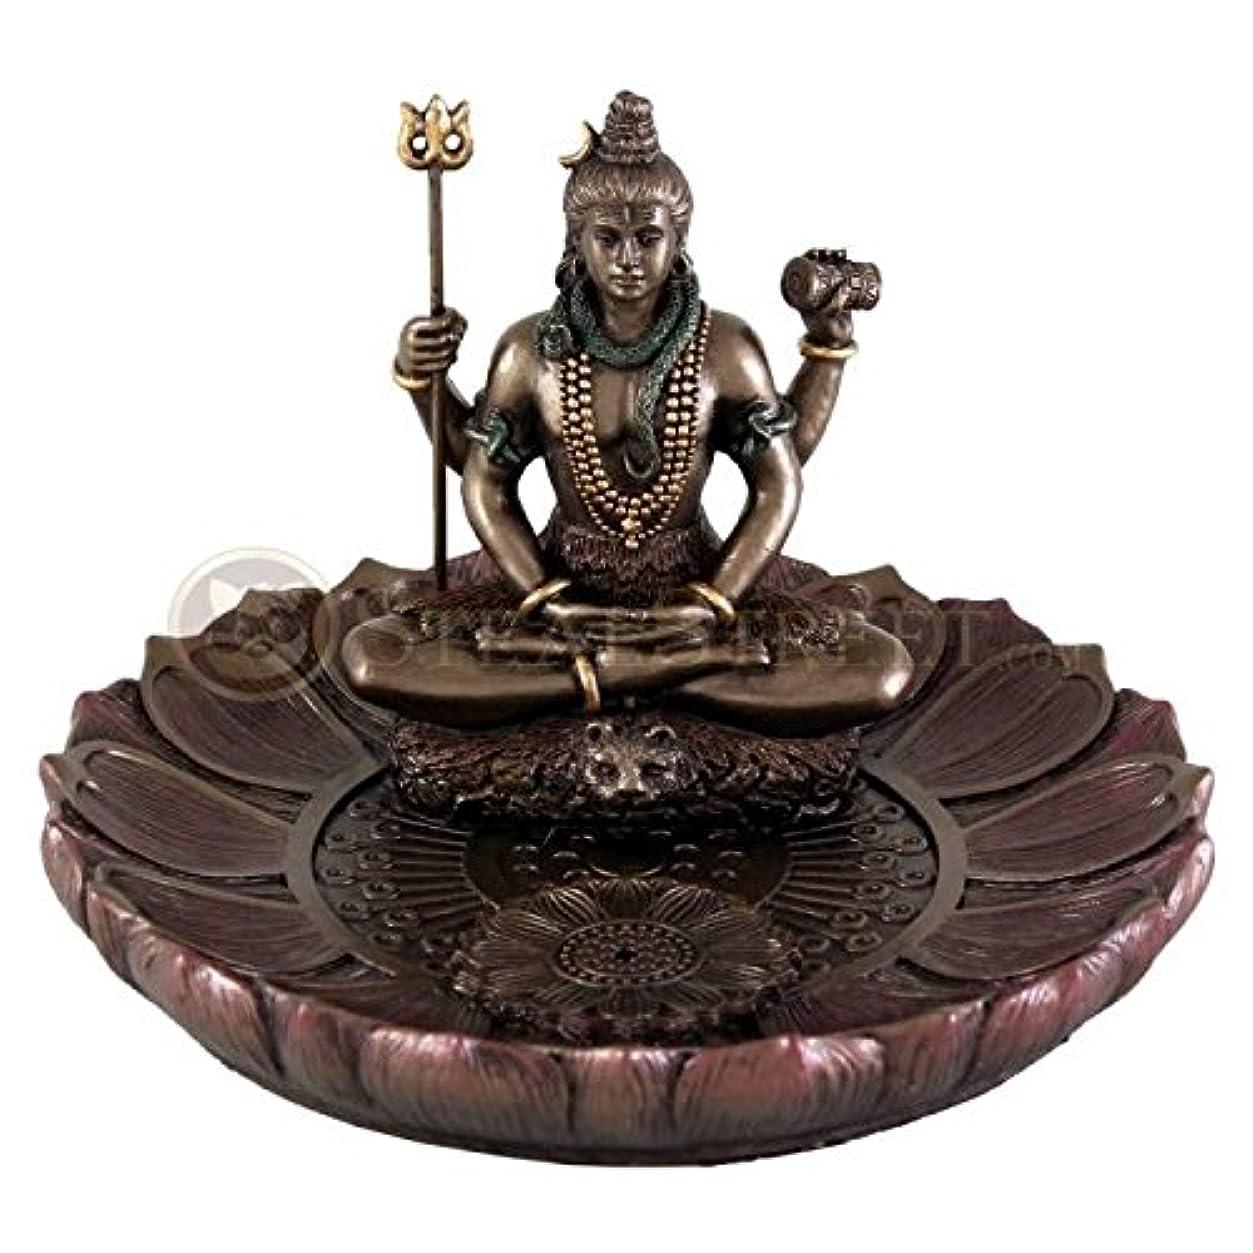 Hindu God Shiva in Meditation Round Incense Holder Plate Incense Burner by Top Collection